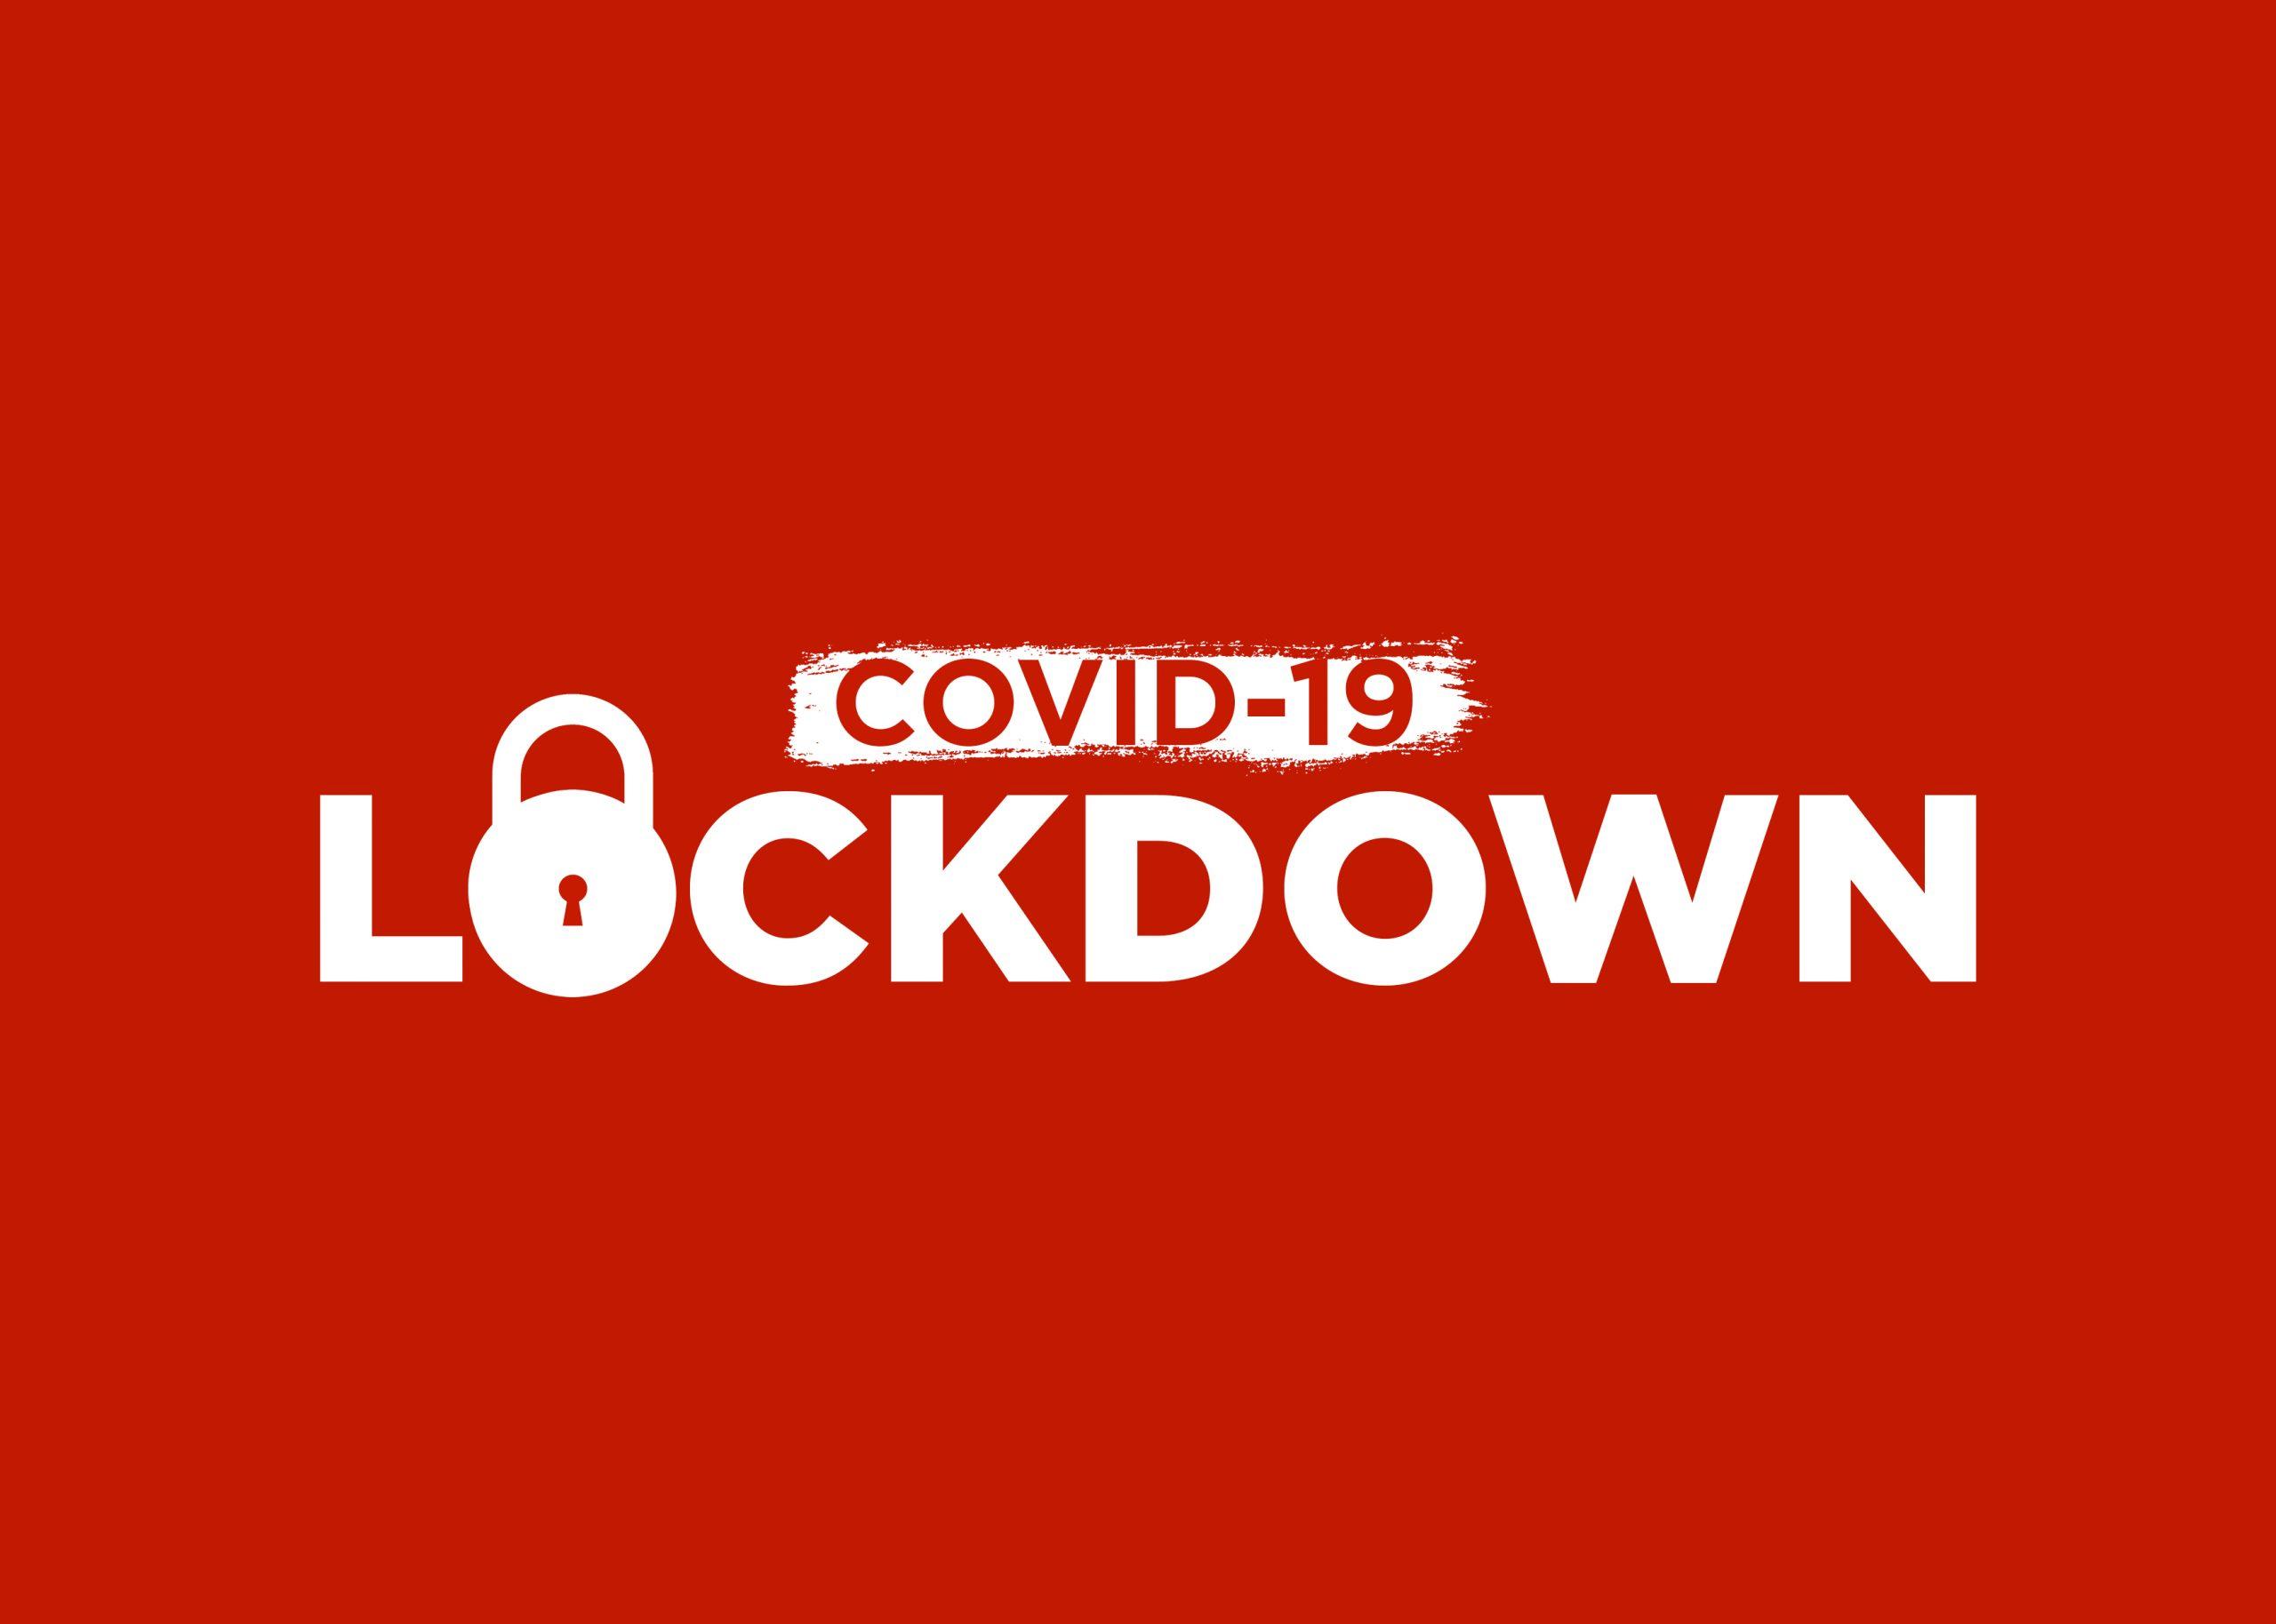 sevencitiesunderlockdowninmadhyapradesh